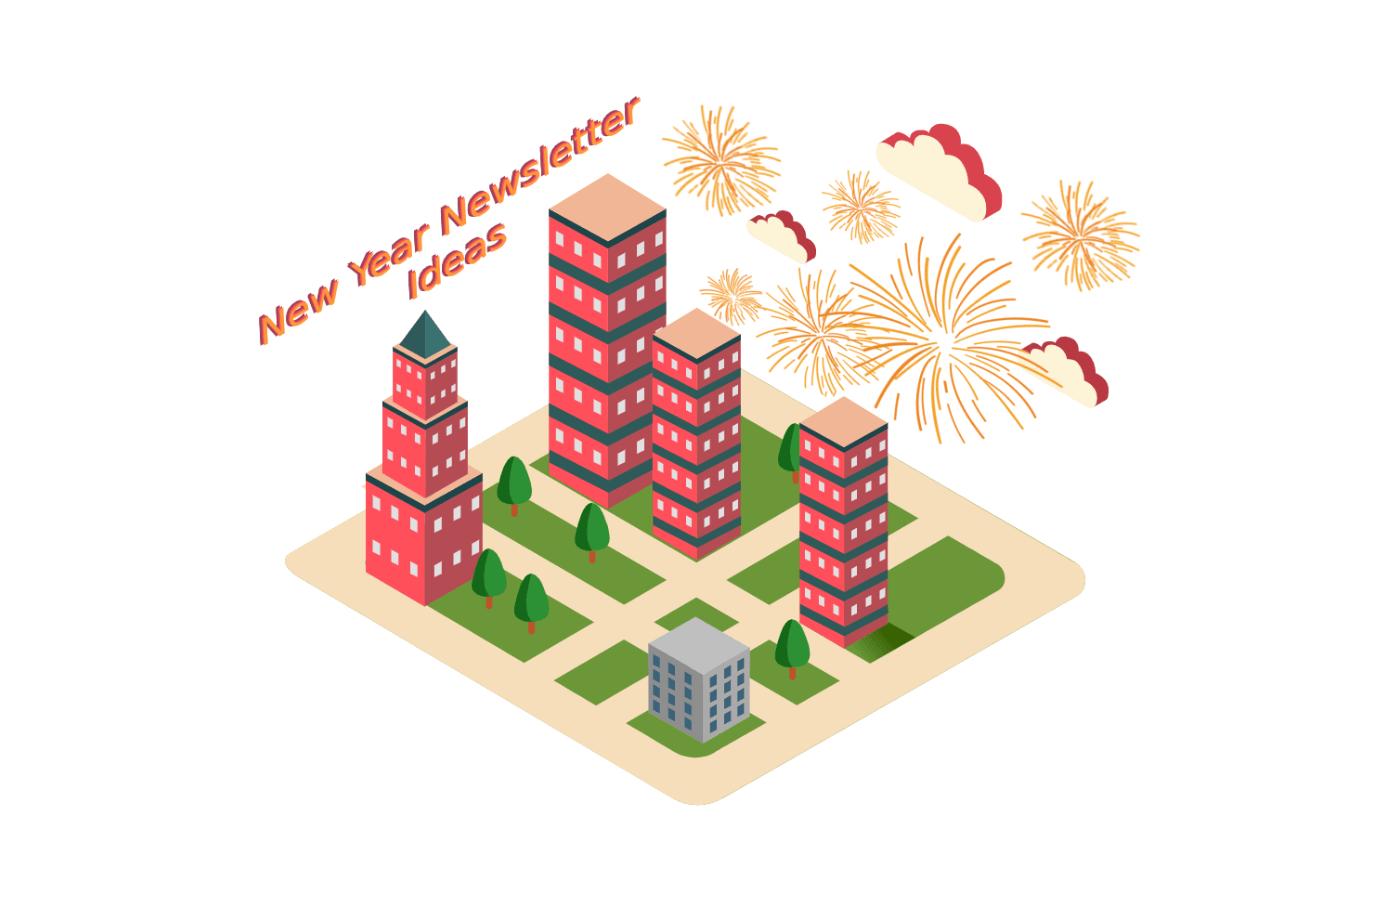 new_year_newsletter_ideas